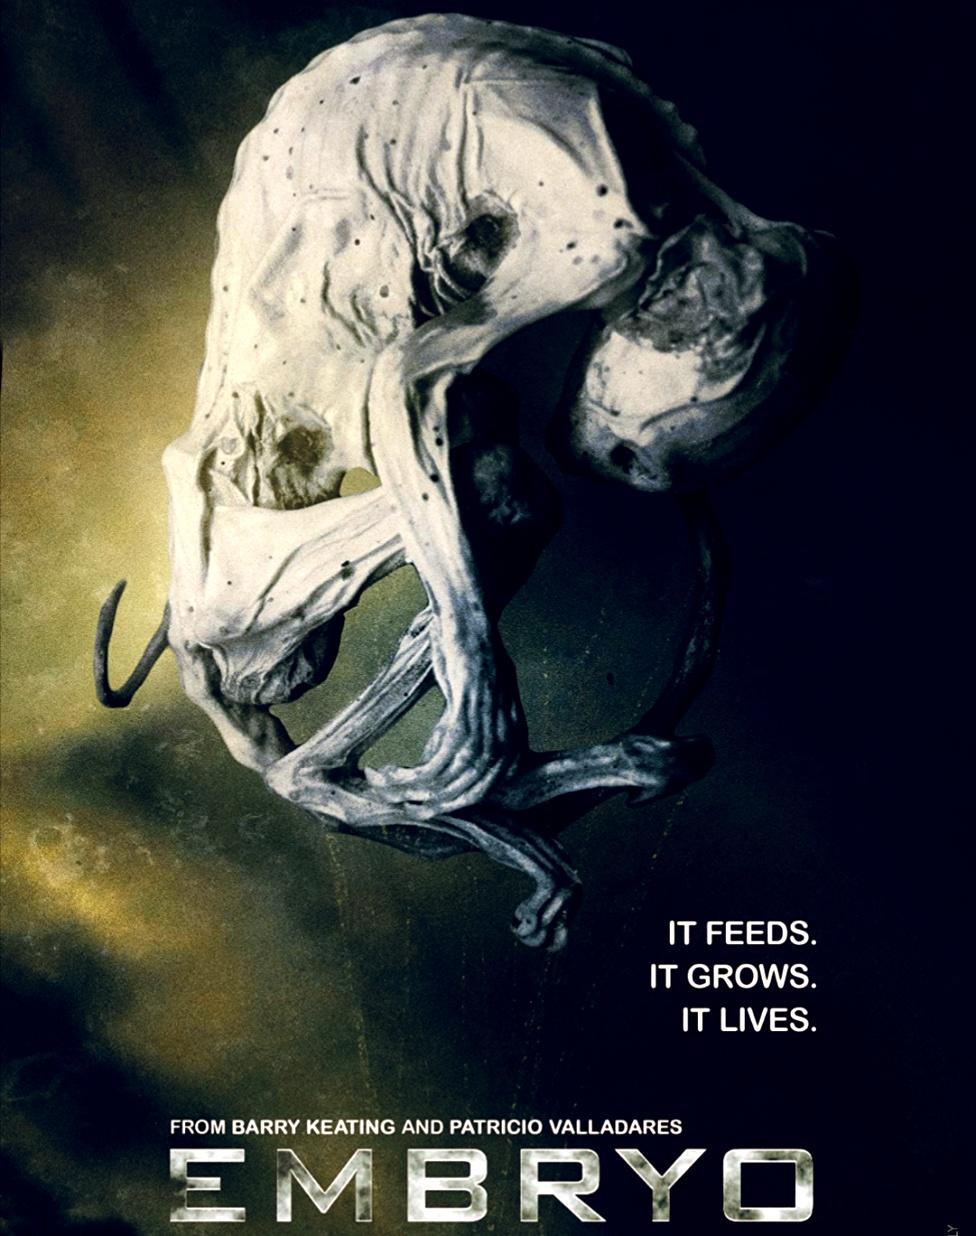 Embryo (2020) Bengali Dubbed (Voice Over) WEBRip 720p [Full Movie] 1XBET